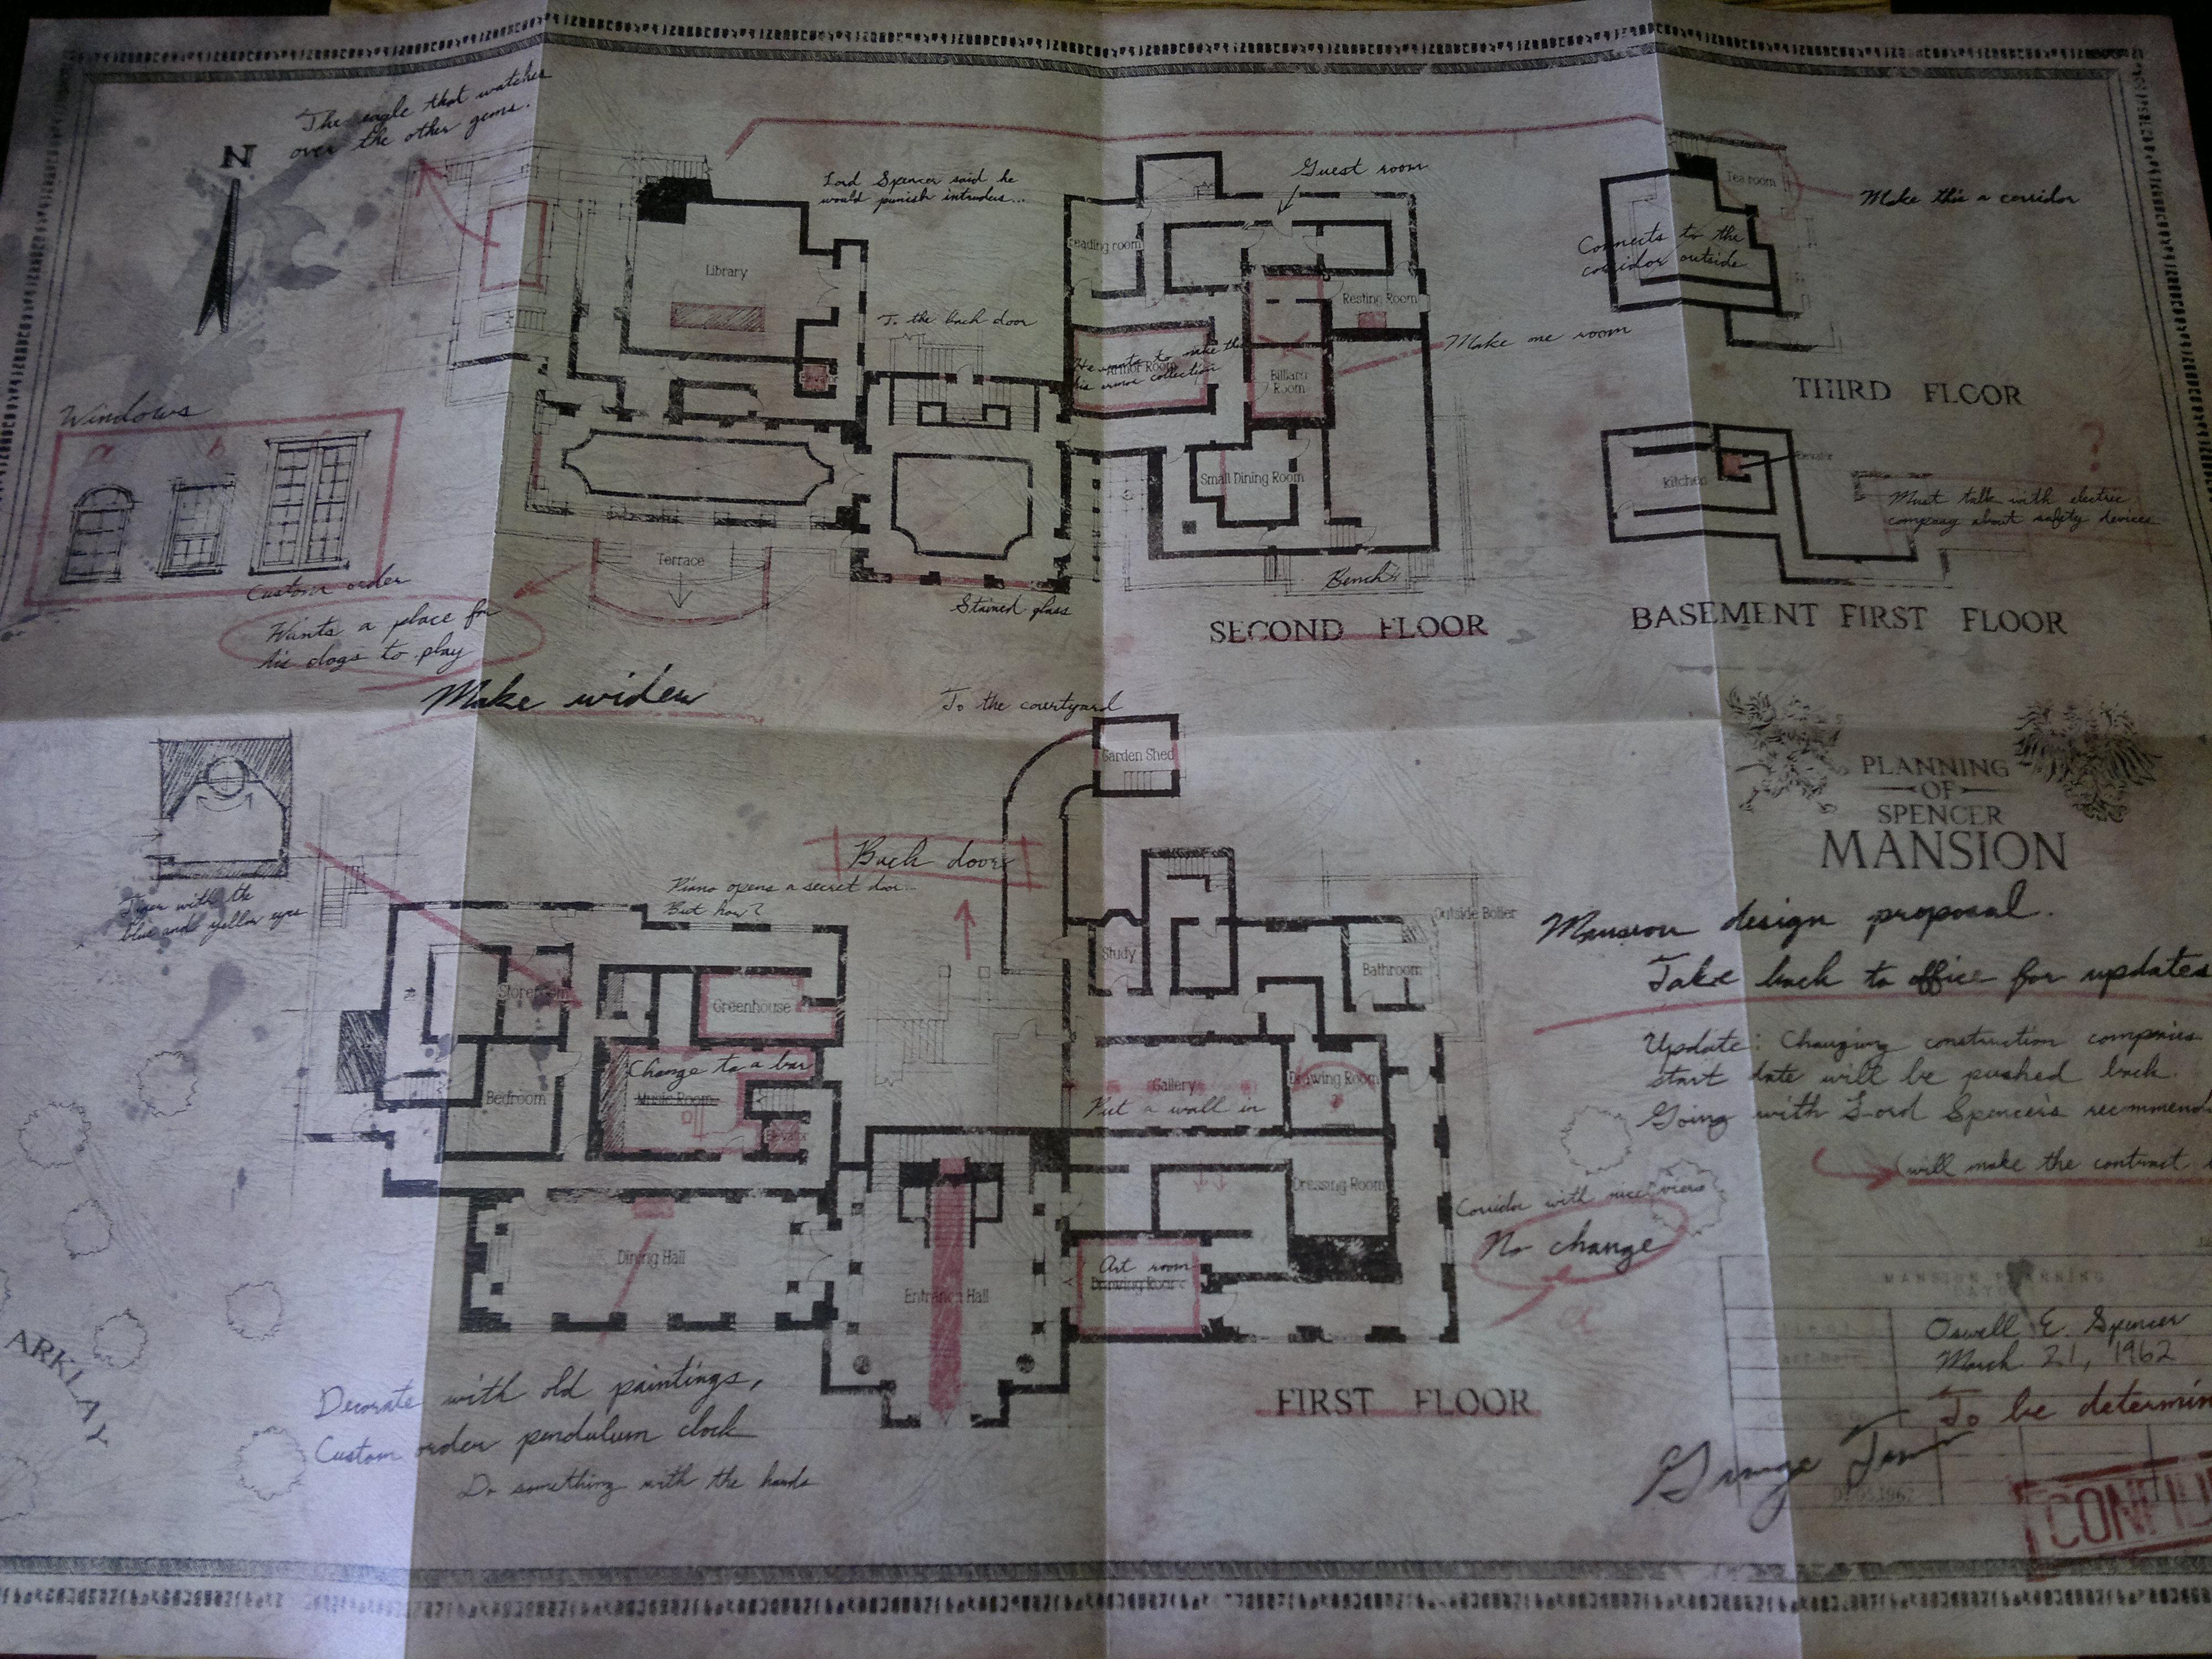 Mack Granite Fuse Box Auto Electrical Wiring Diagram 2008 Pinnacle Cv713 Rd688s